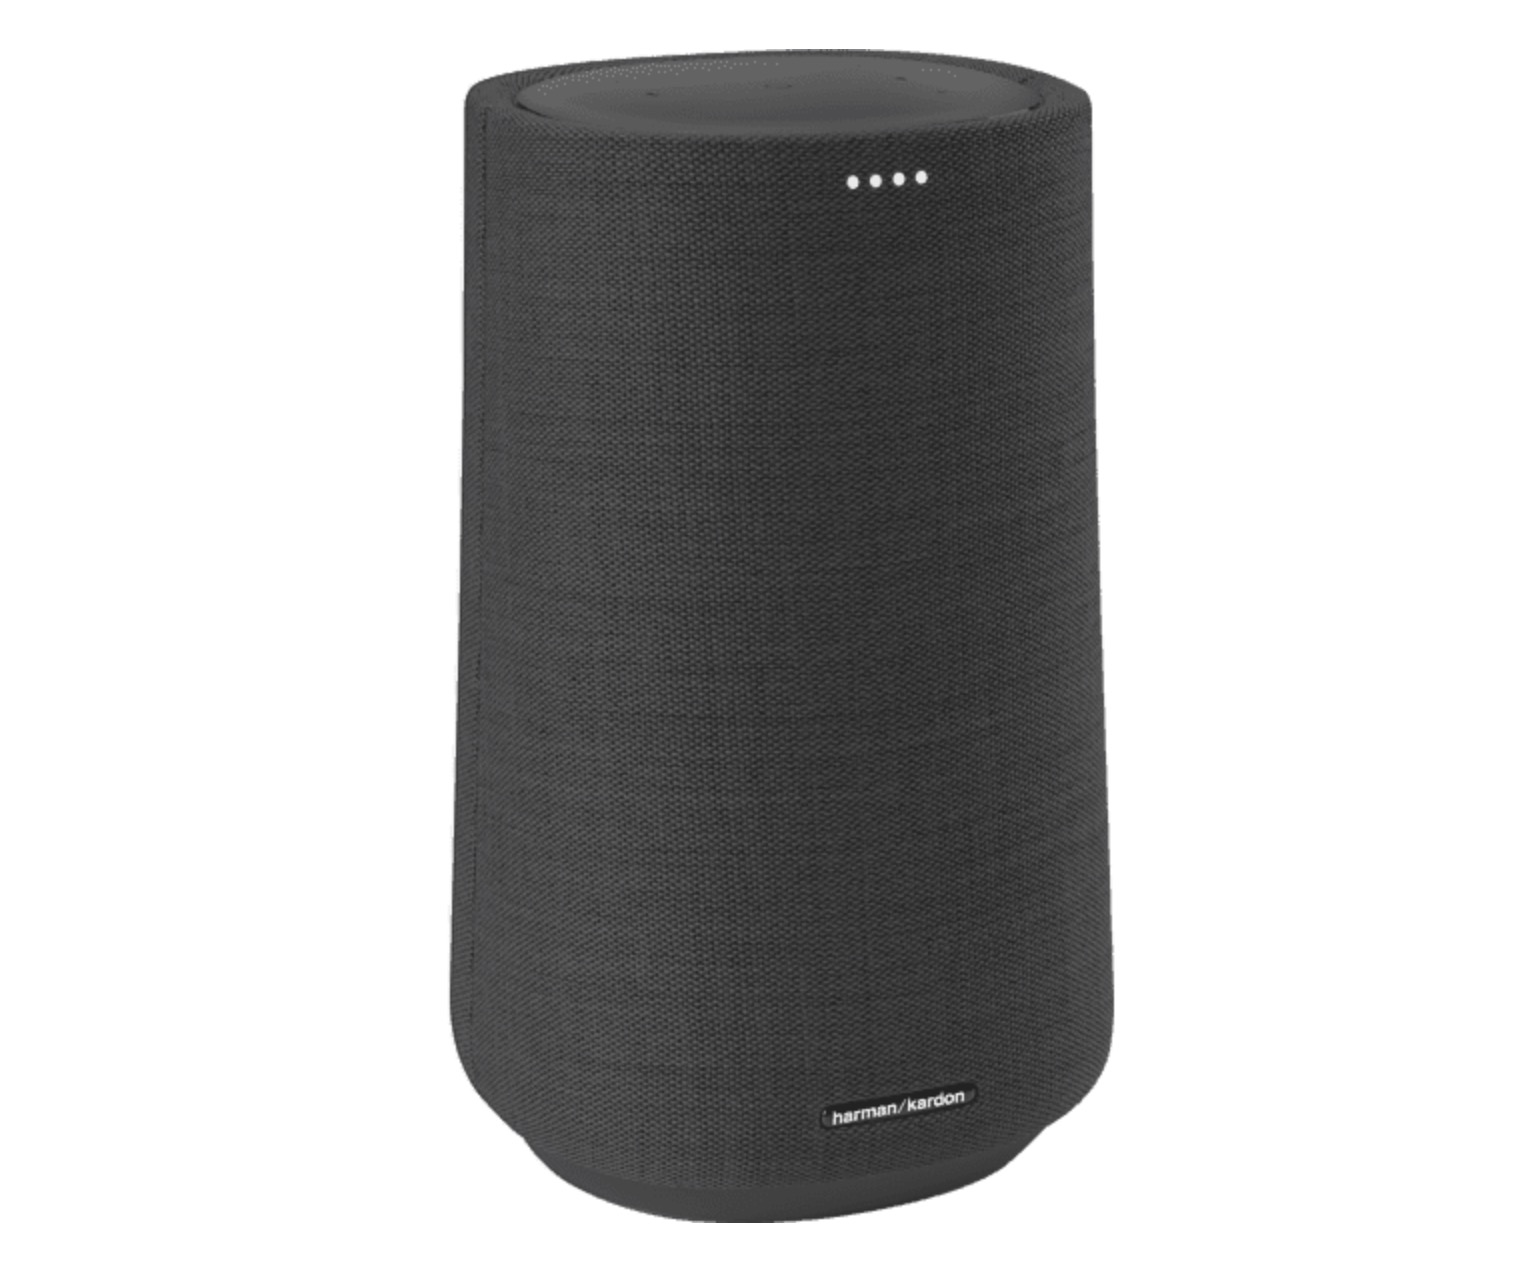 HARMAN KARDON Citation 100 Smart Speaker für nur 174,49 Euro (statt 229,- Euro)